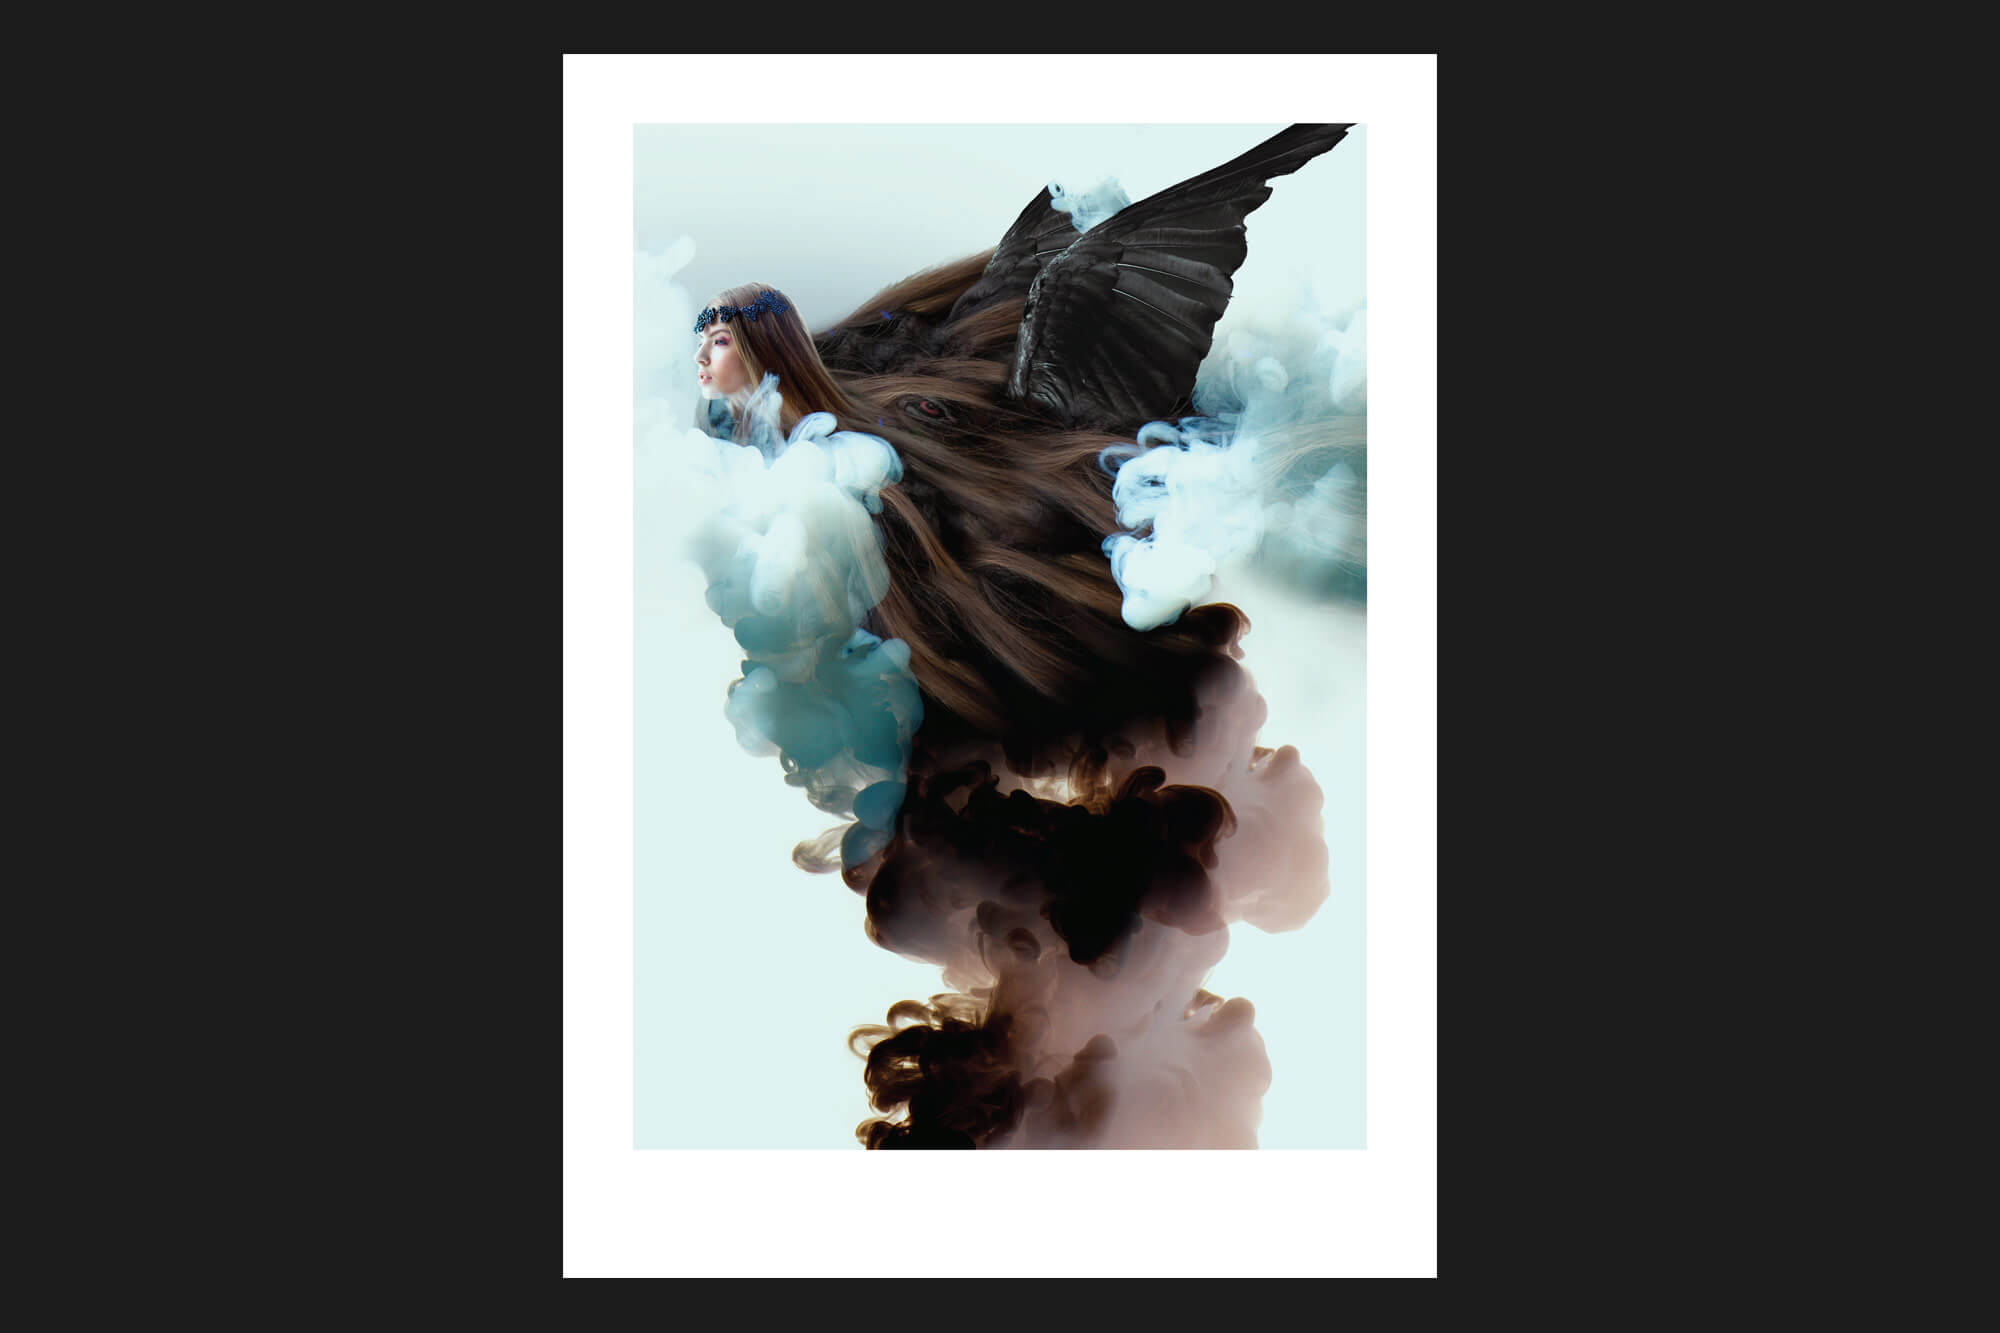 gareth-paul-jones-studio-design-neringa-rekasiute-photography-7788-art-identity-series-cs-04